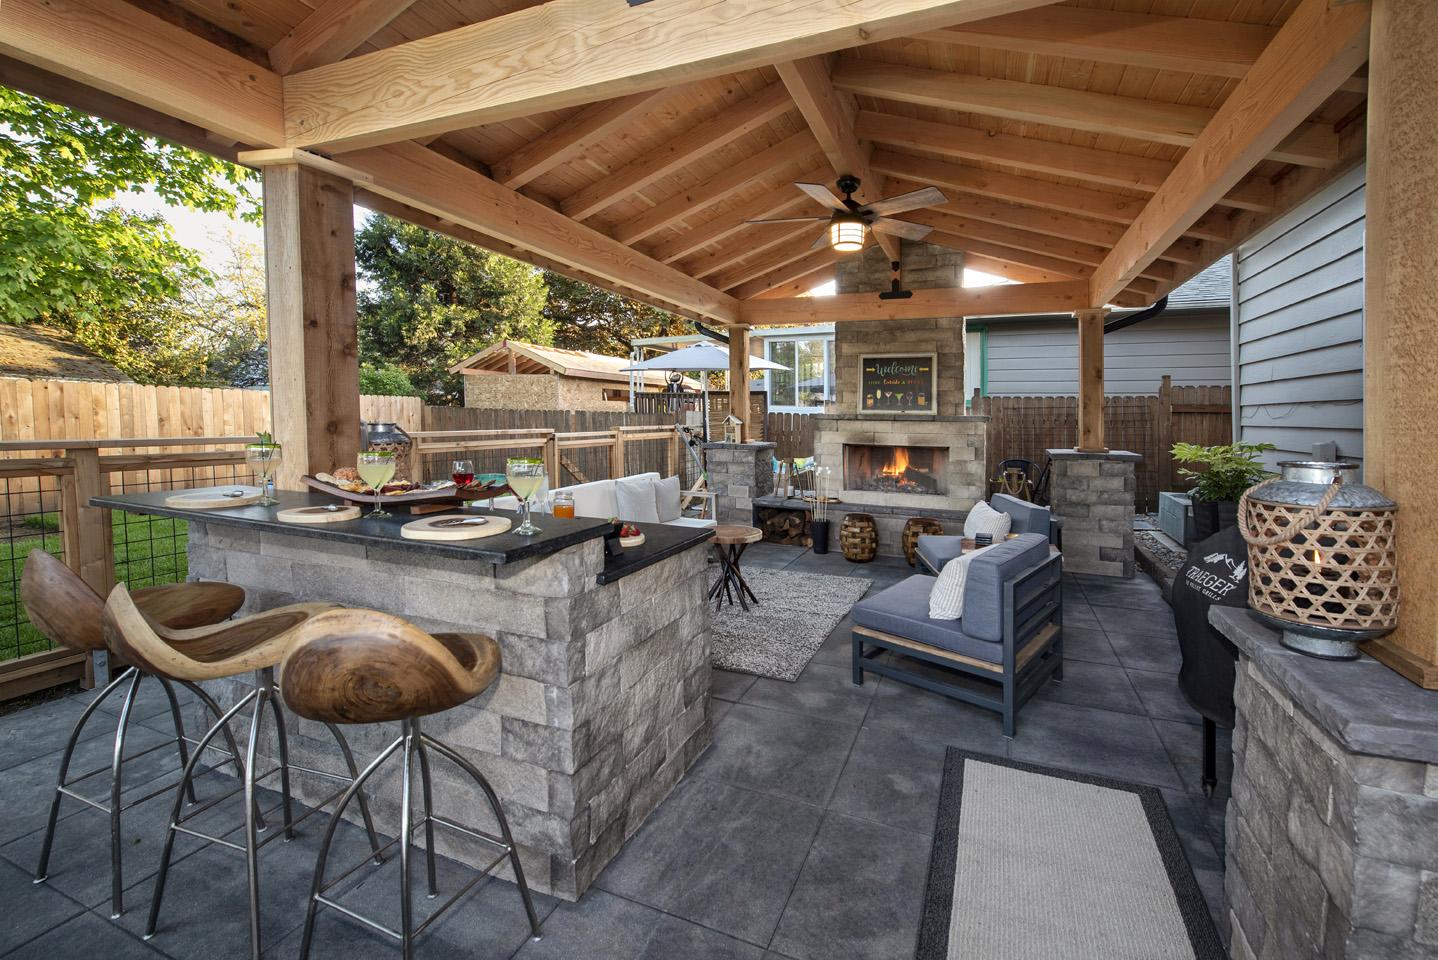 Backyard Patio Designs - Paradise Restored Landscaping on Backyard Patio Designs  id=38751